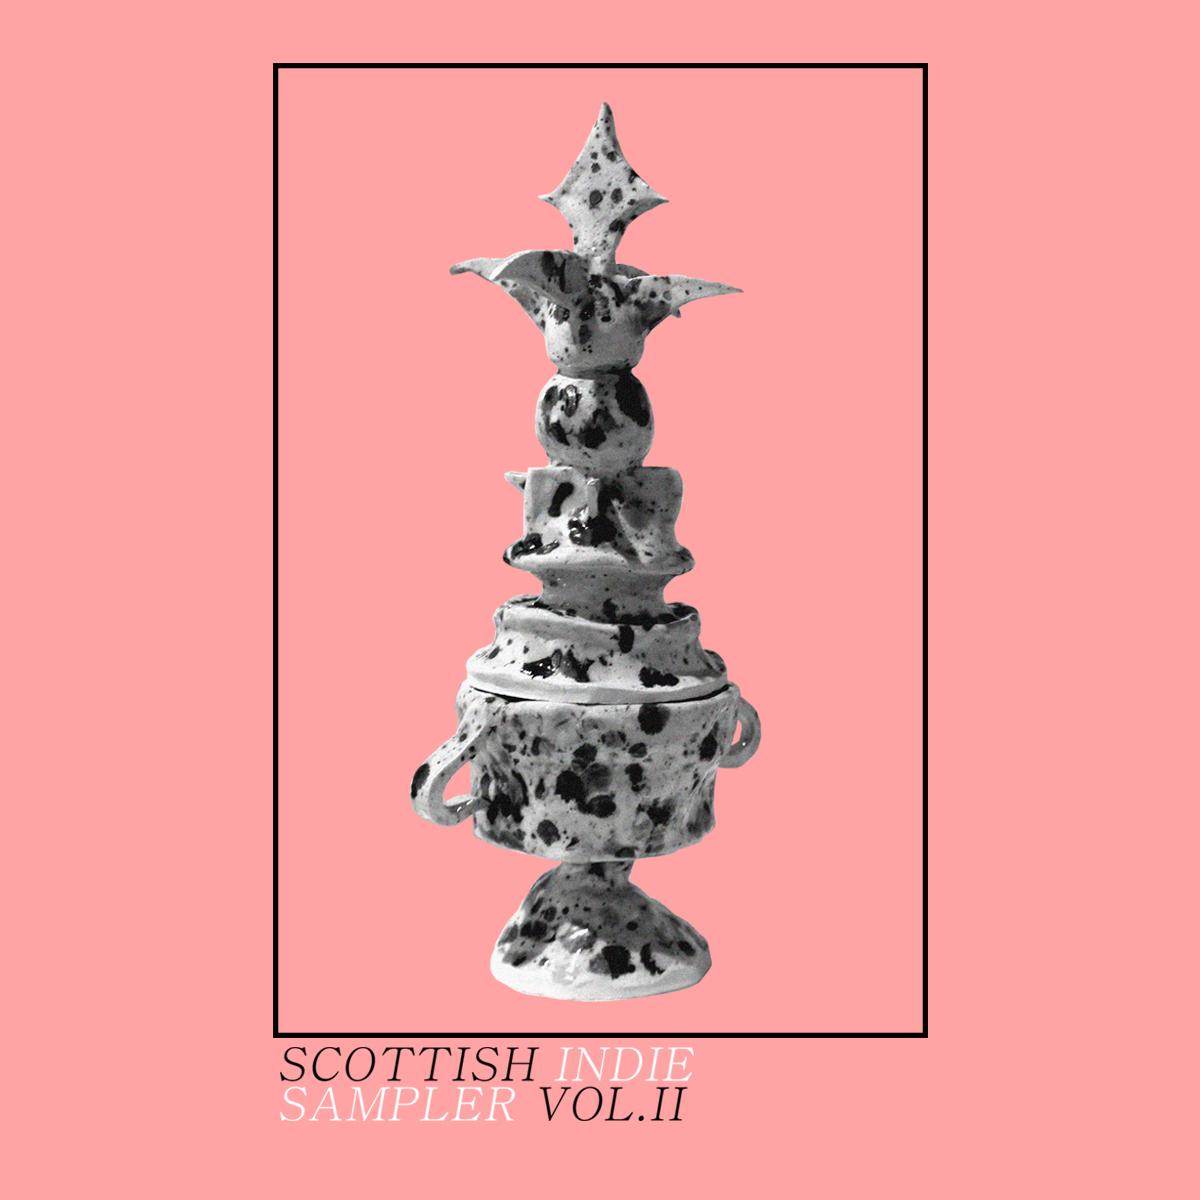 Scottish Indie Sampler Vol. II